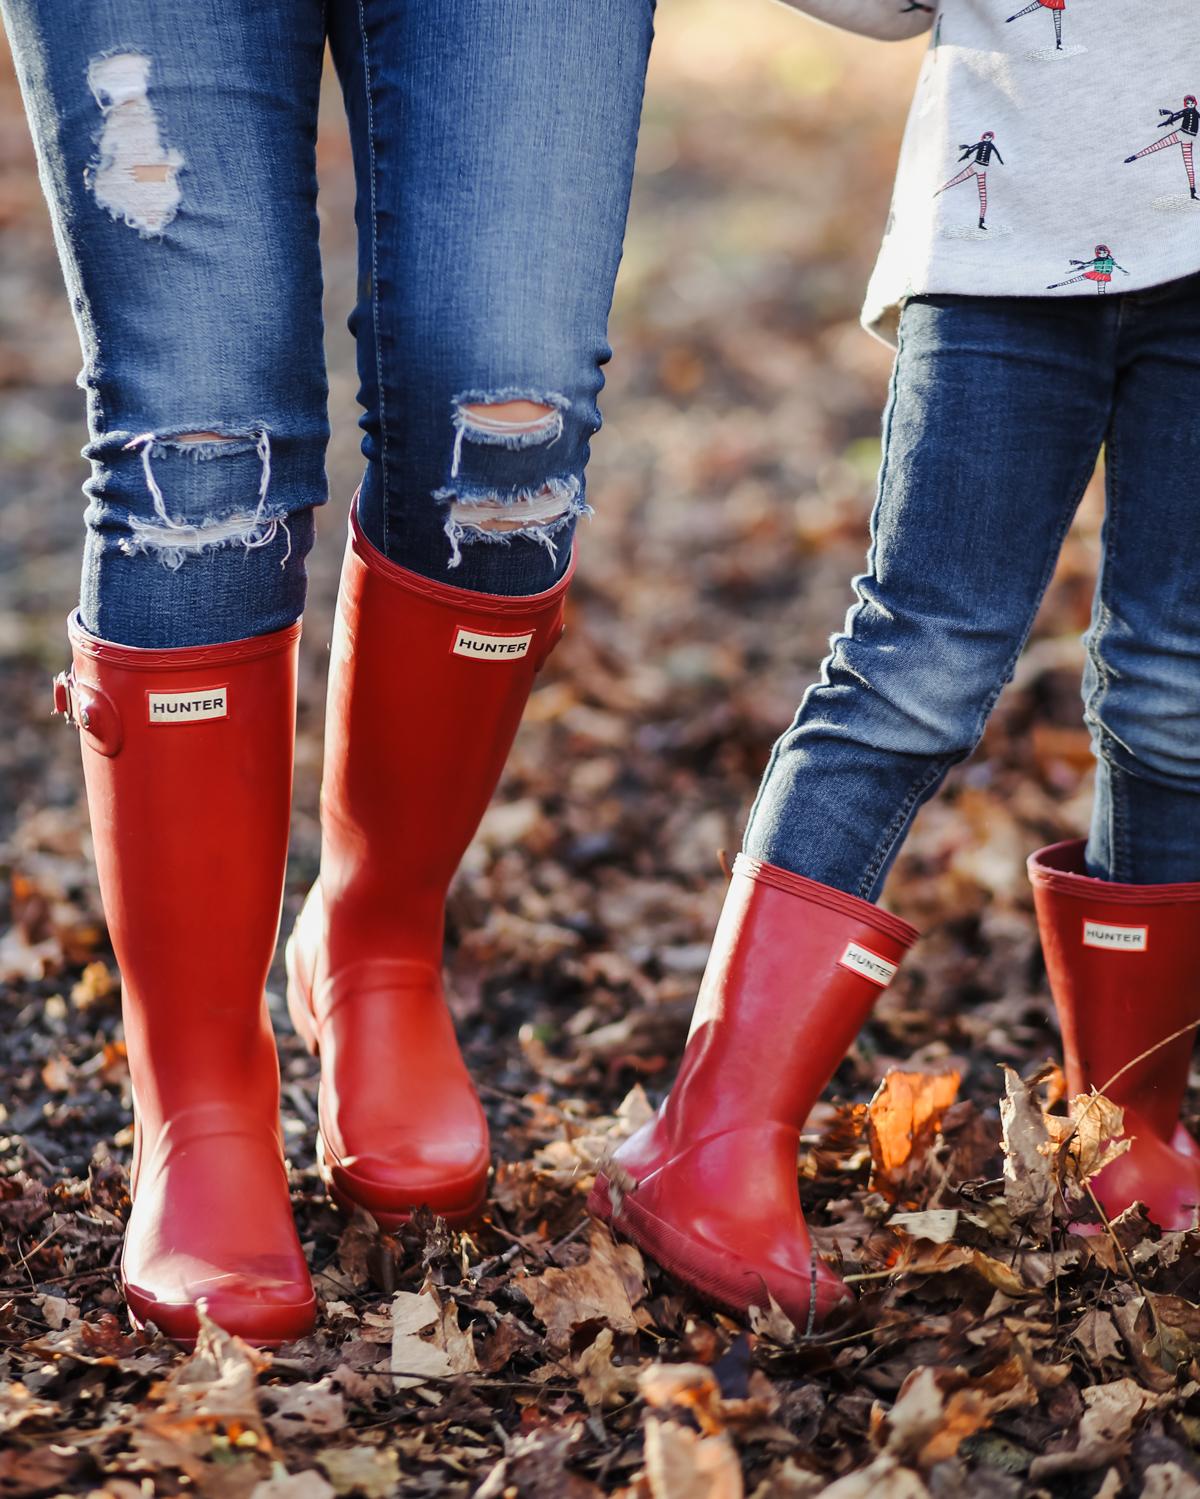 nordstrom kids shoes hunter boots-10